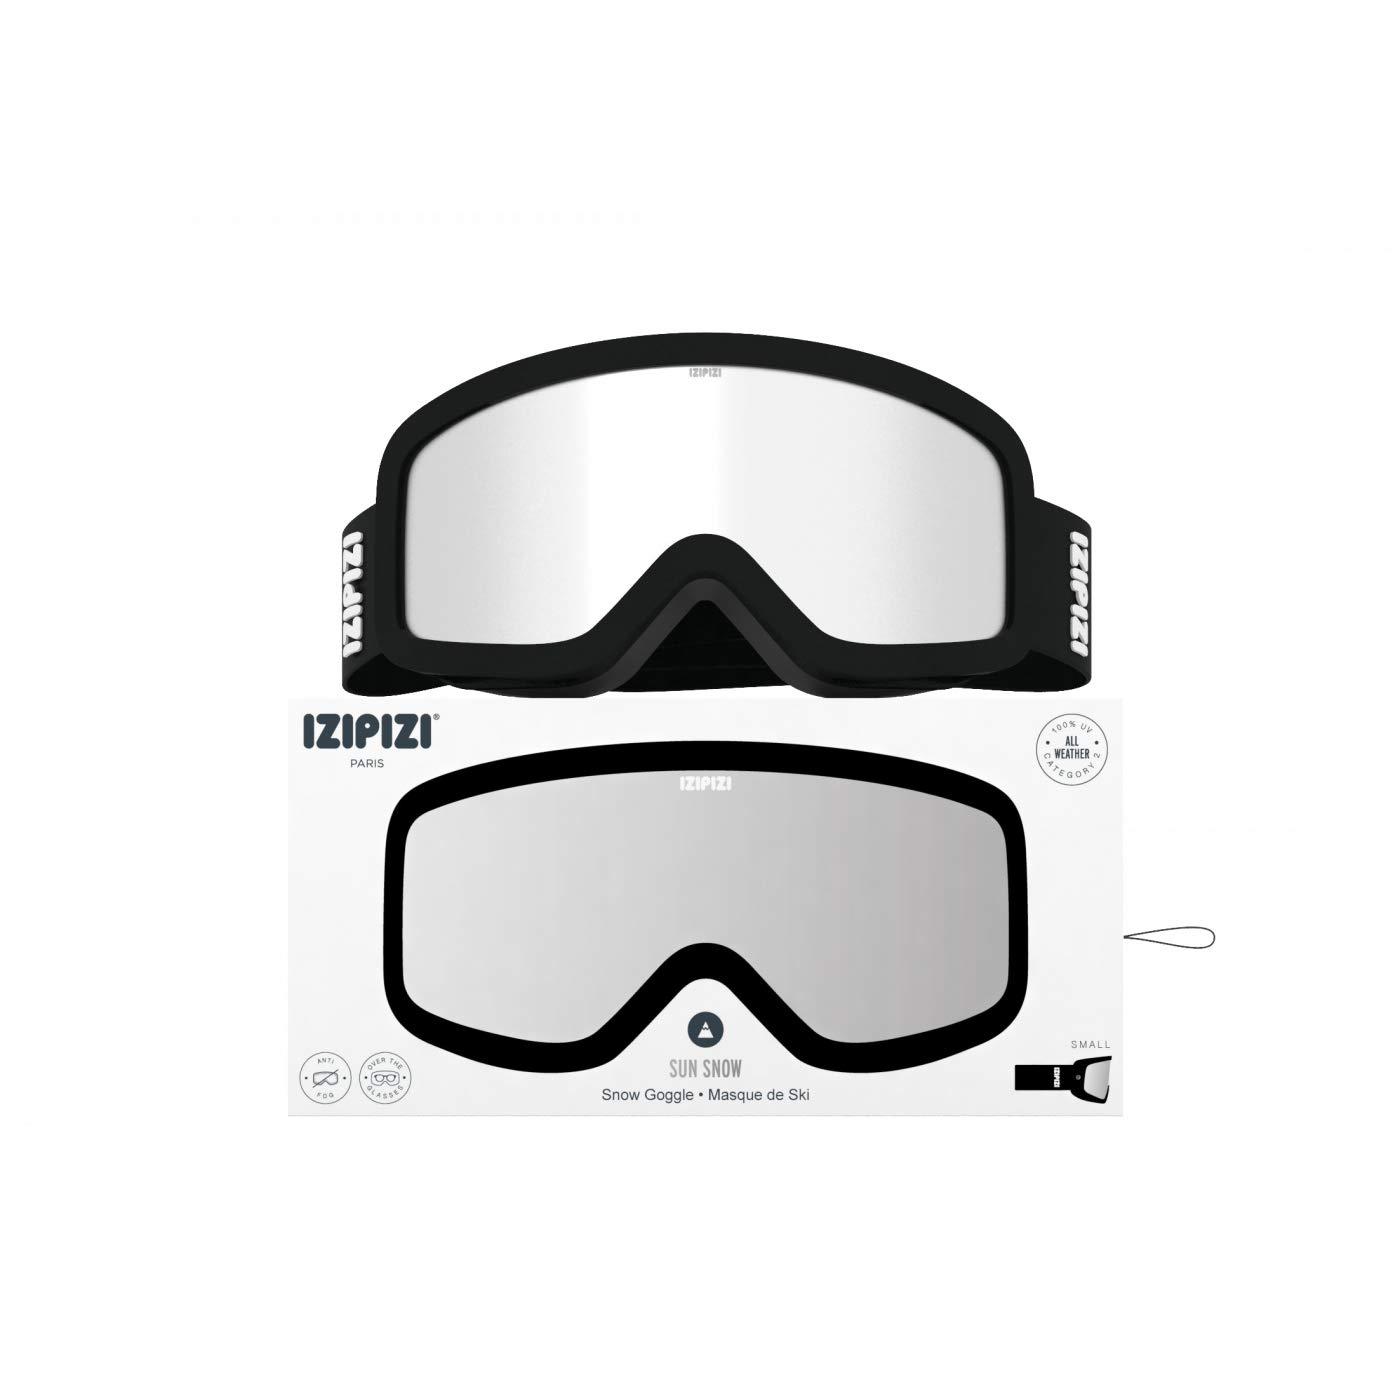 IZI/_SUNSNOW/_BLK Izipizi S Sun Snow Ski Mask Snowboard Negro Lente Negro